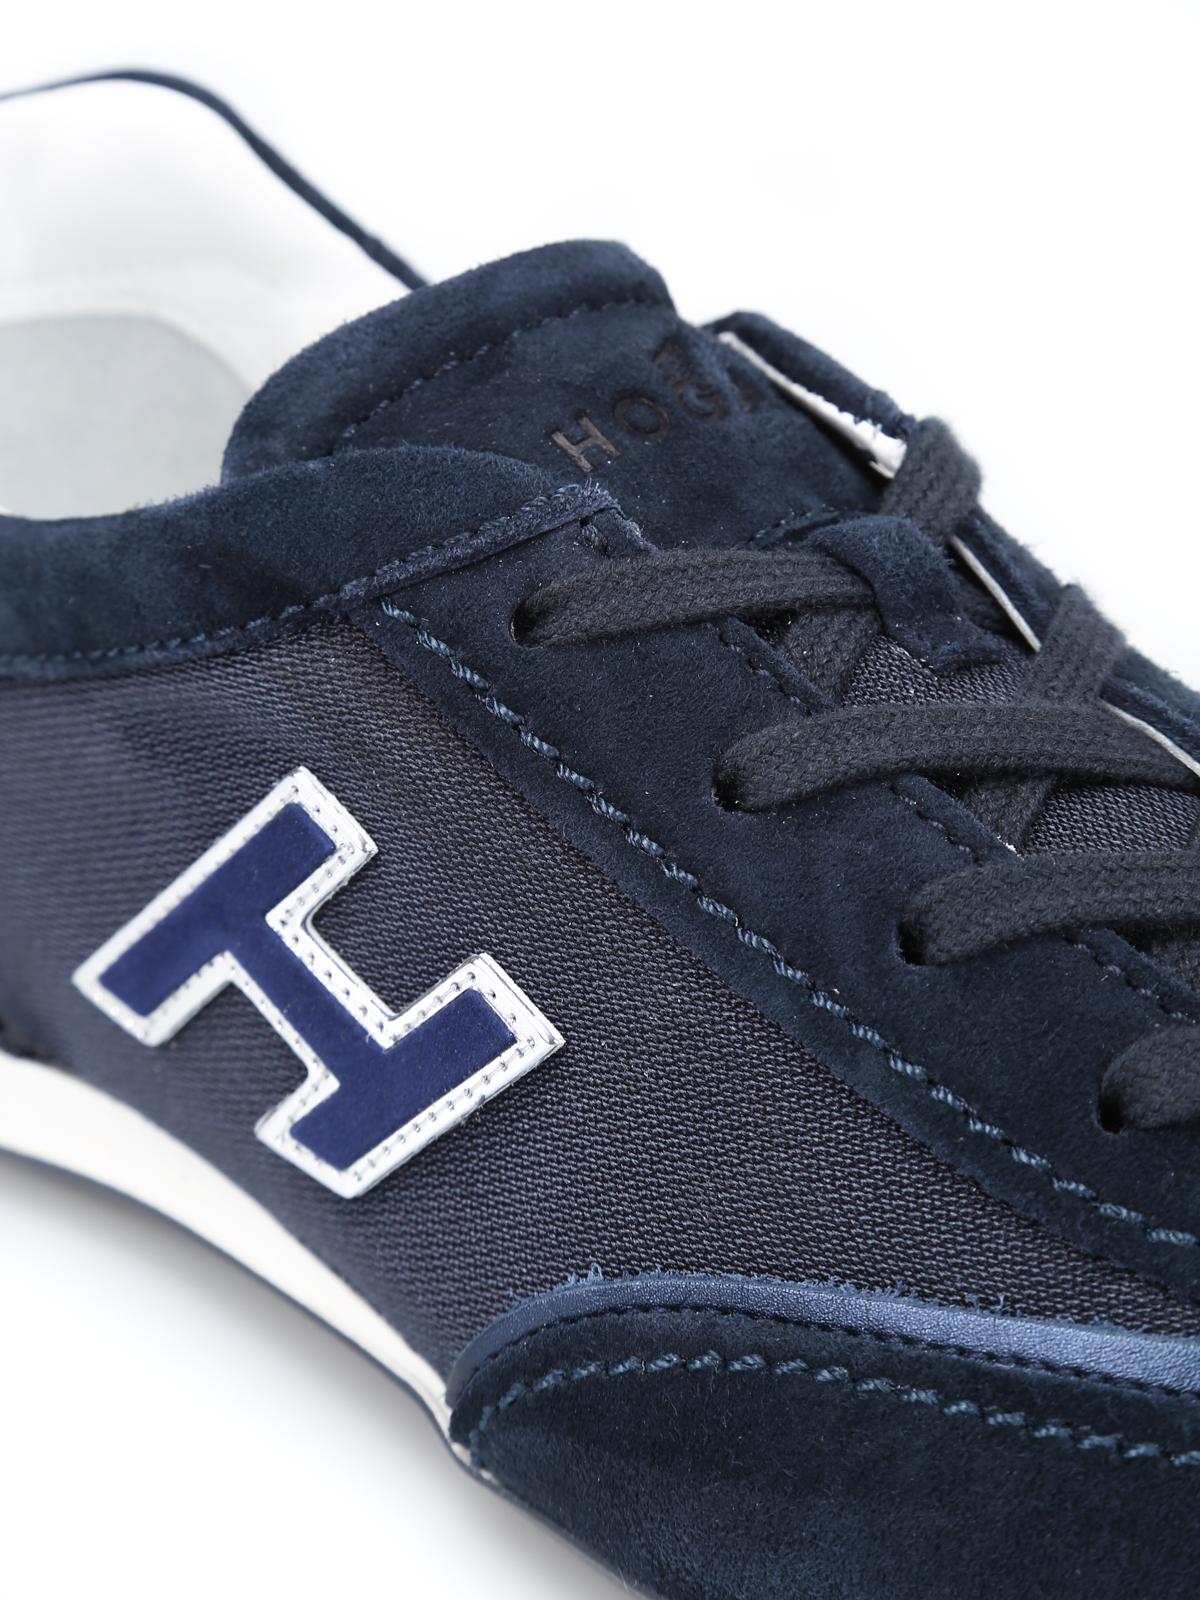 Trainers Hogan - Olympia blue sneakers - HXW05201684FP60KLA ...